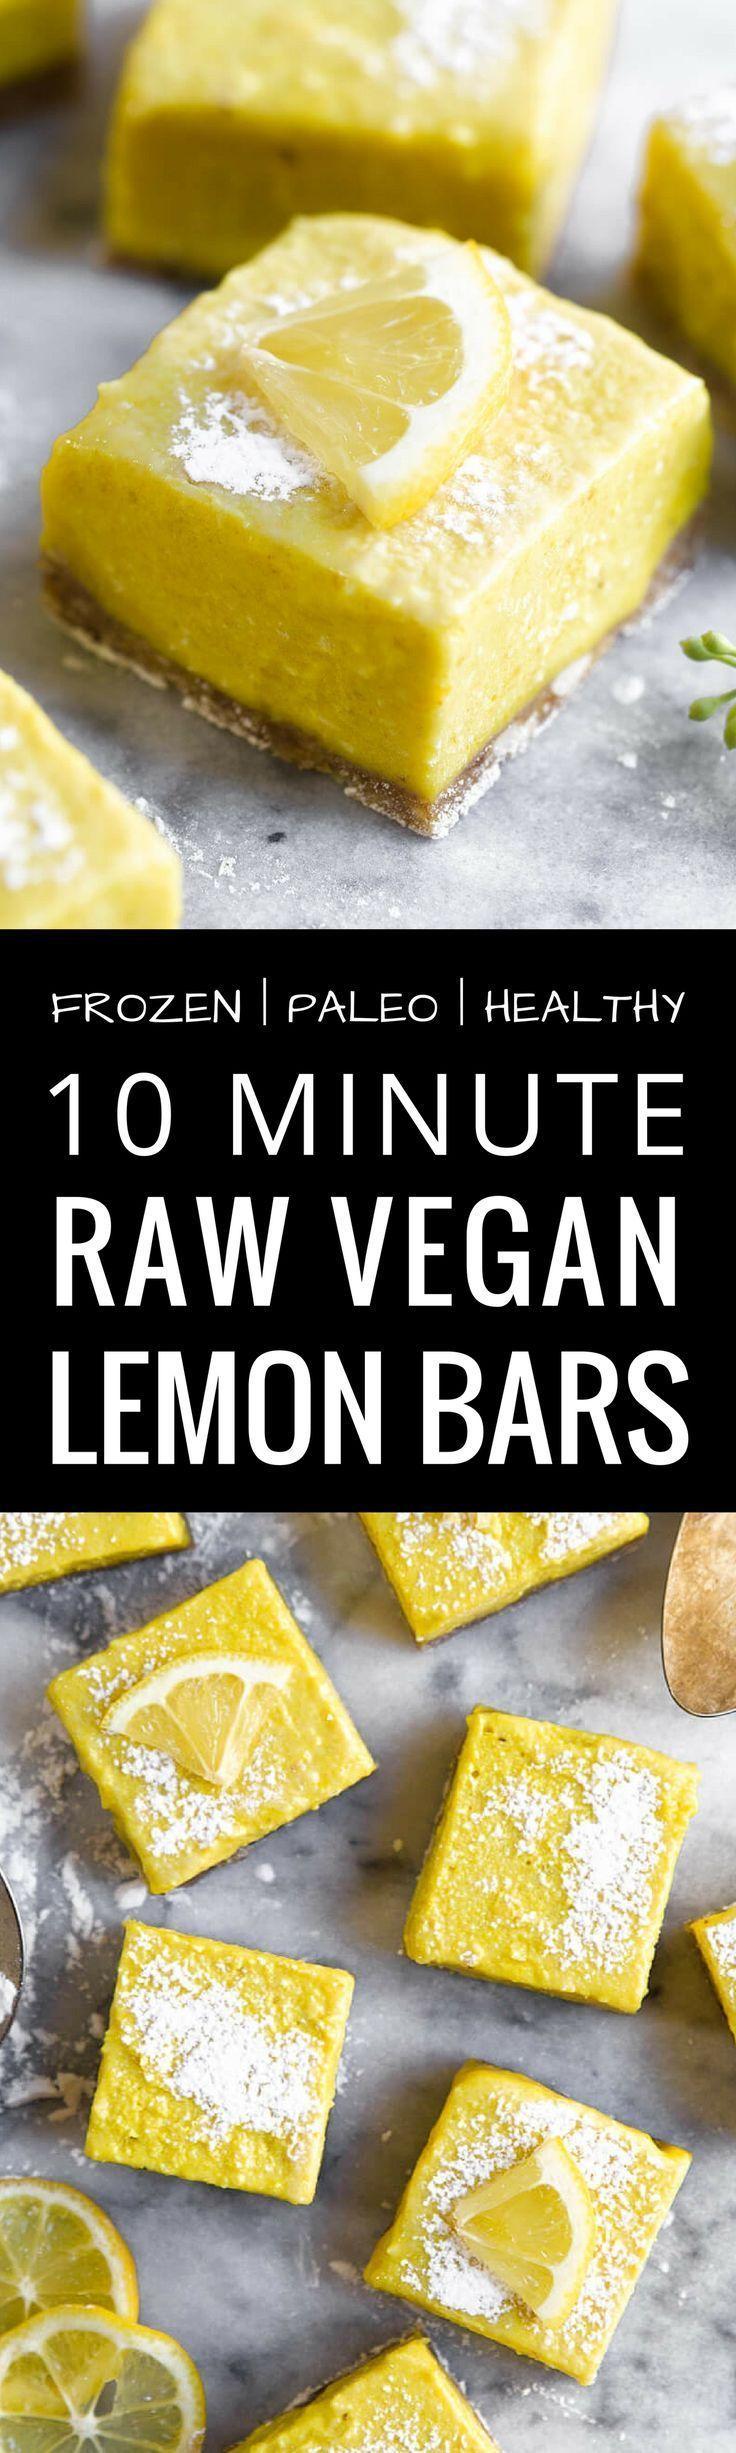 Frozen Raw Paleo Lemon Bars http://healthyquickly.com